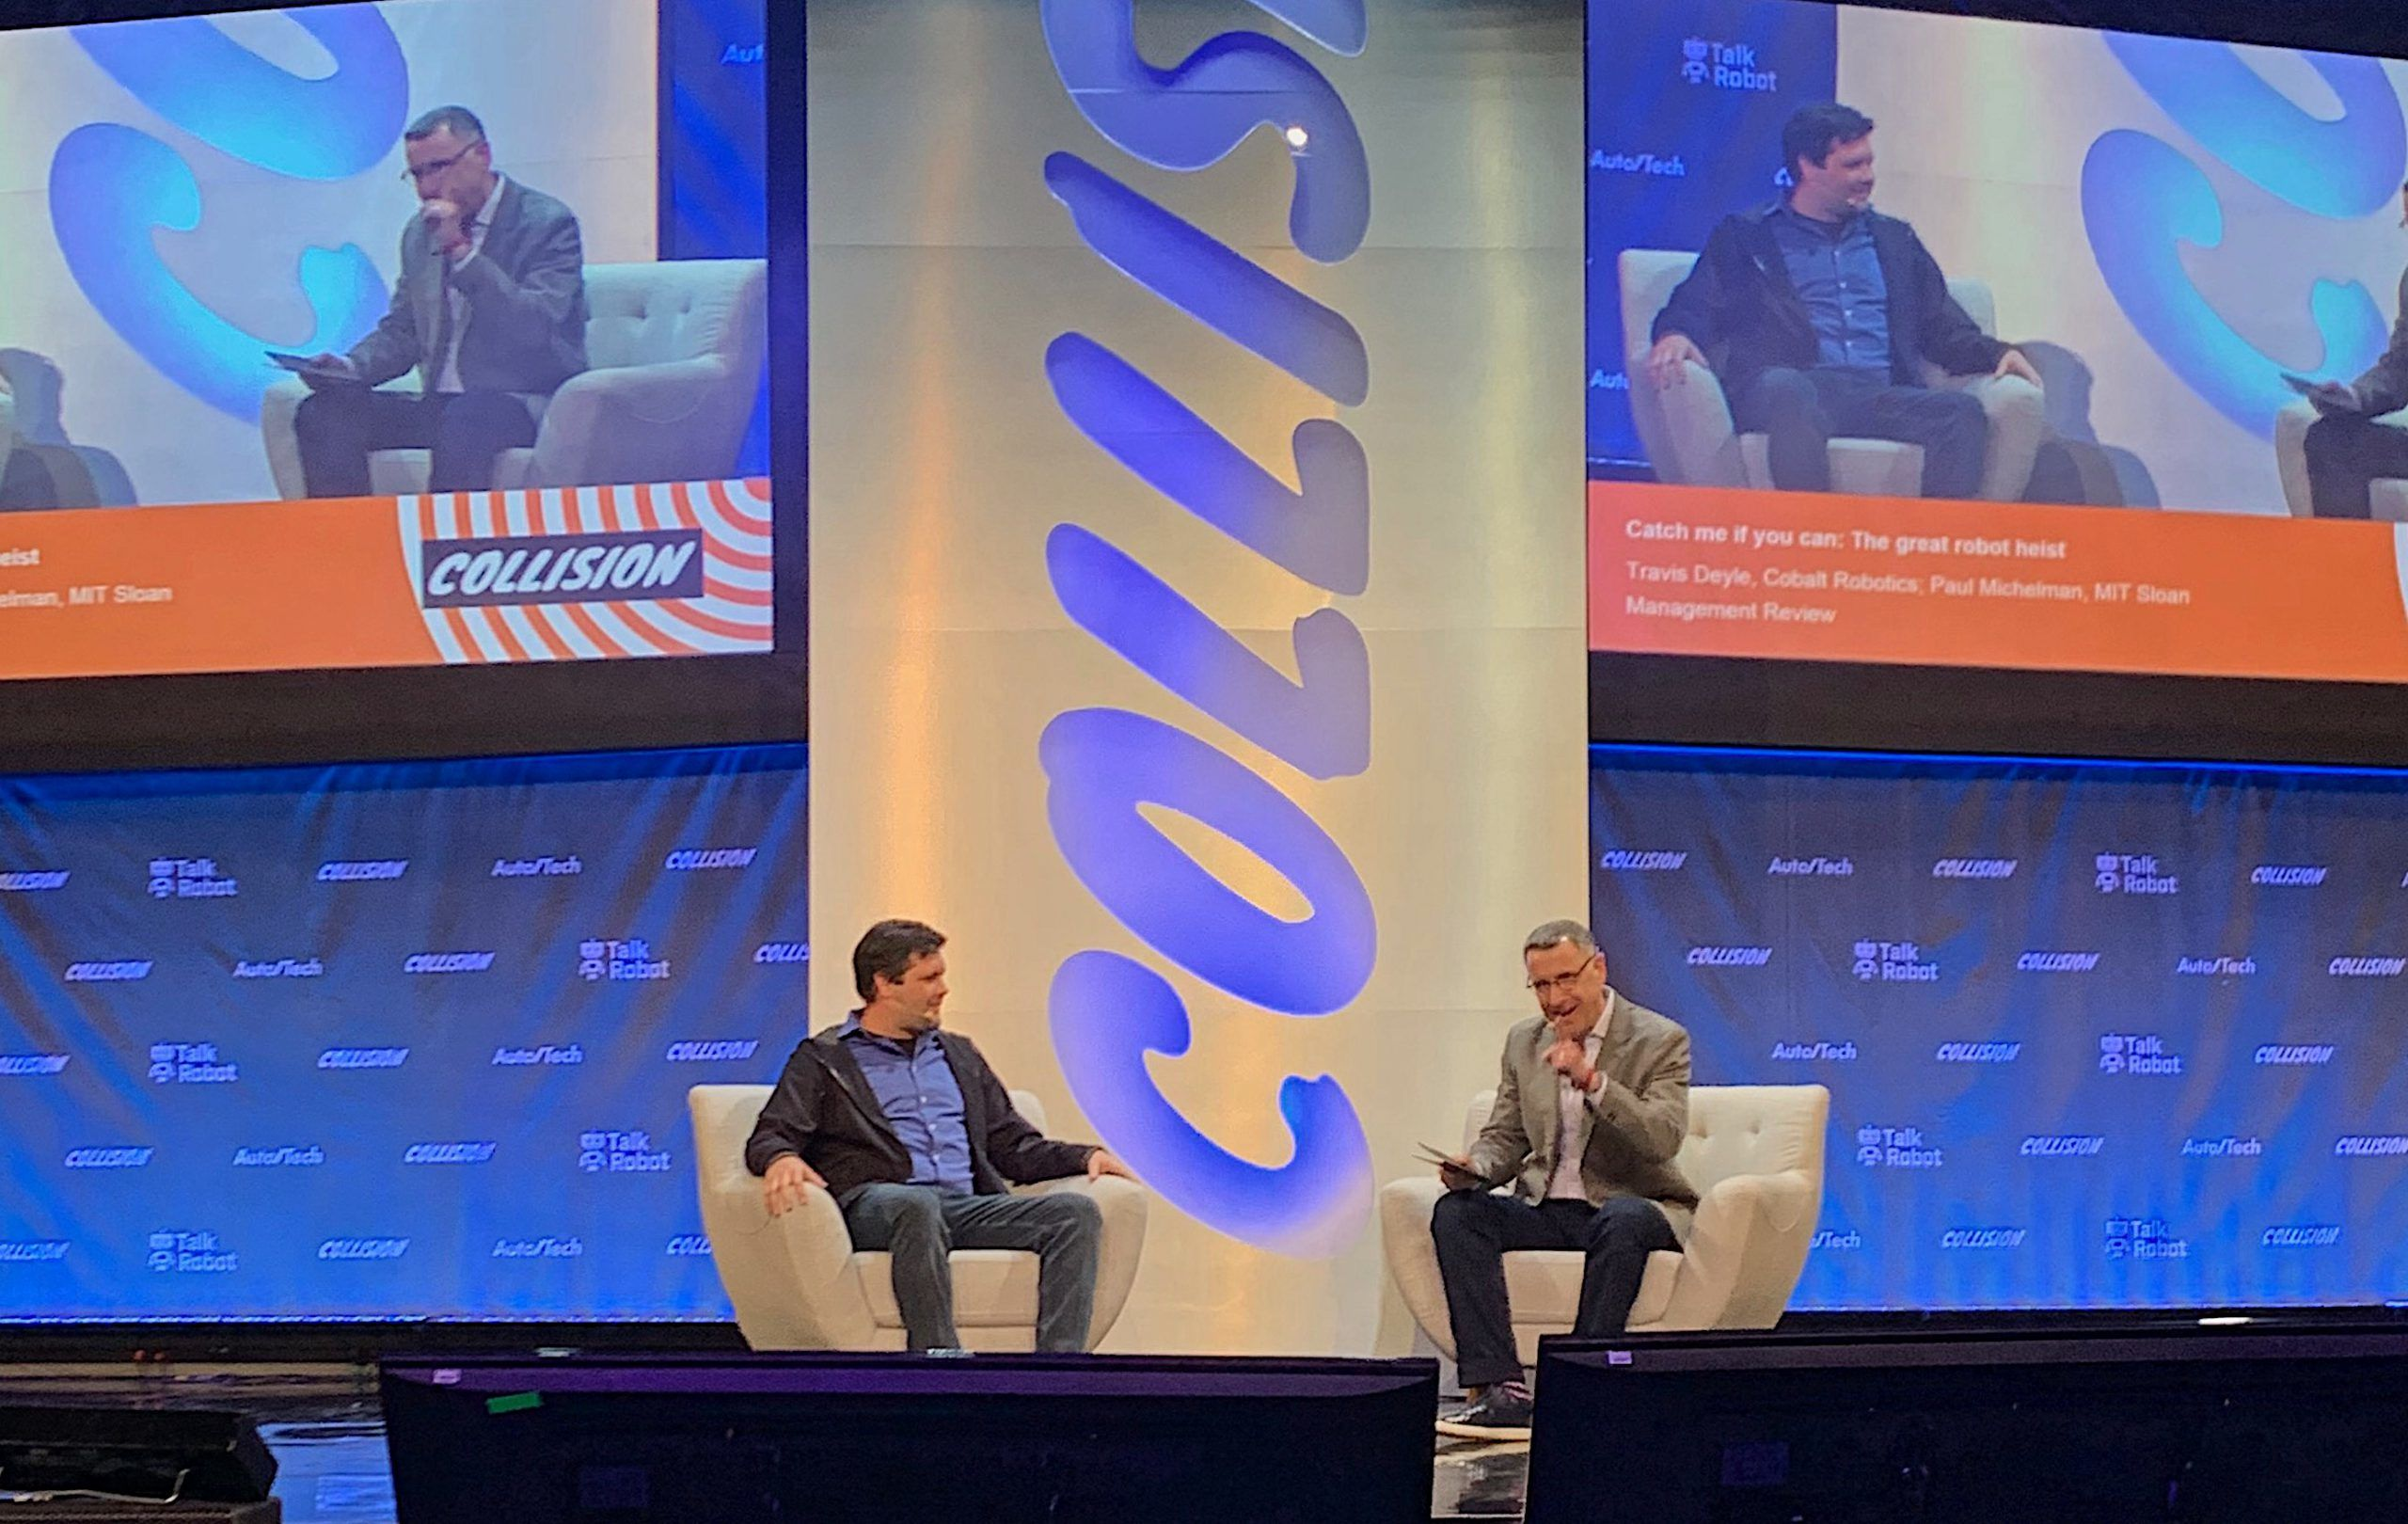 Cobalt CEO Travis Deyle at Collision Conference